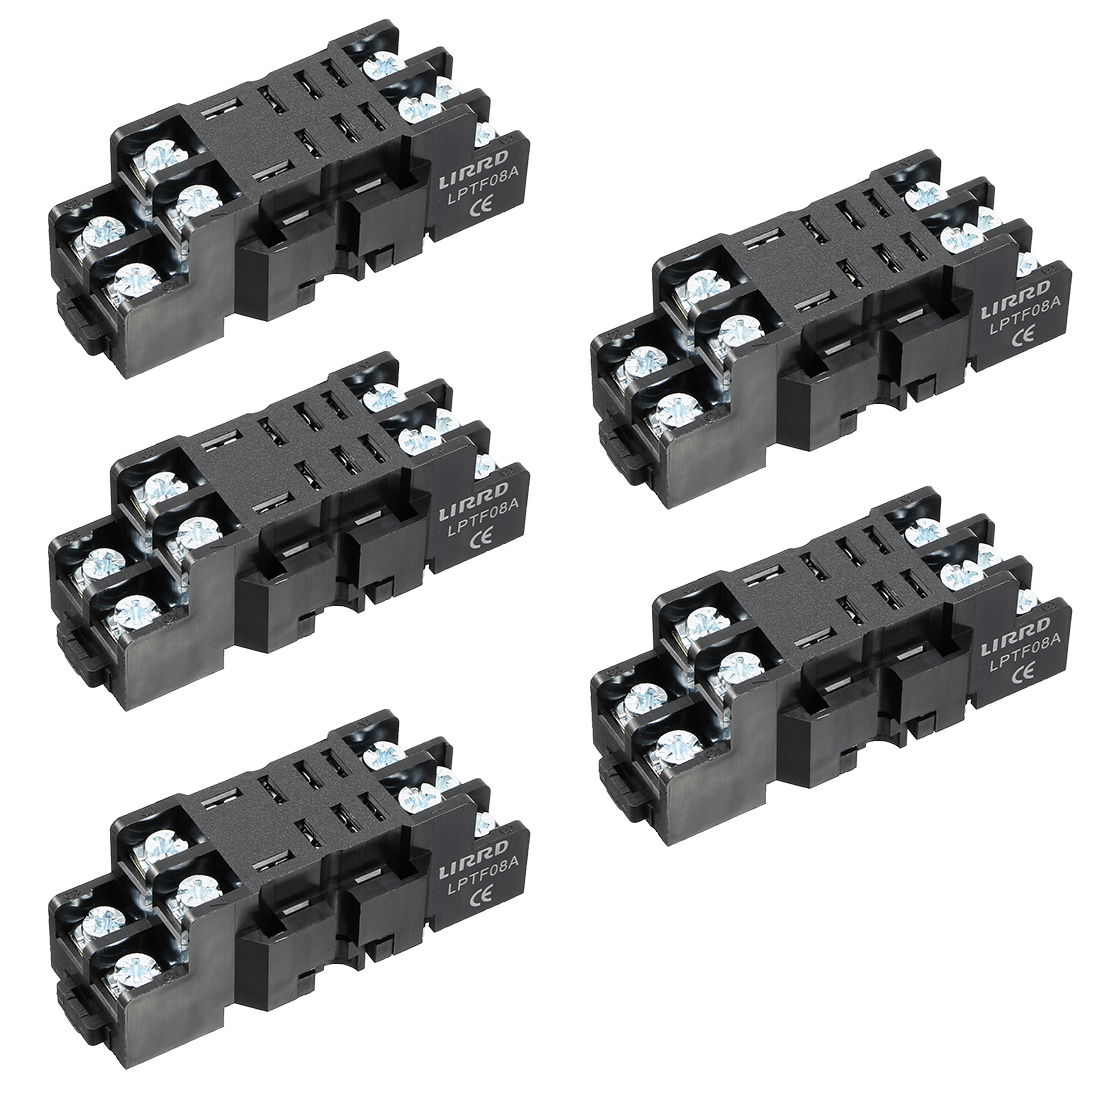 5Pcs, 10A 8P DIN Rail Mount Power Relay Socket Base Holder